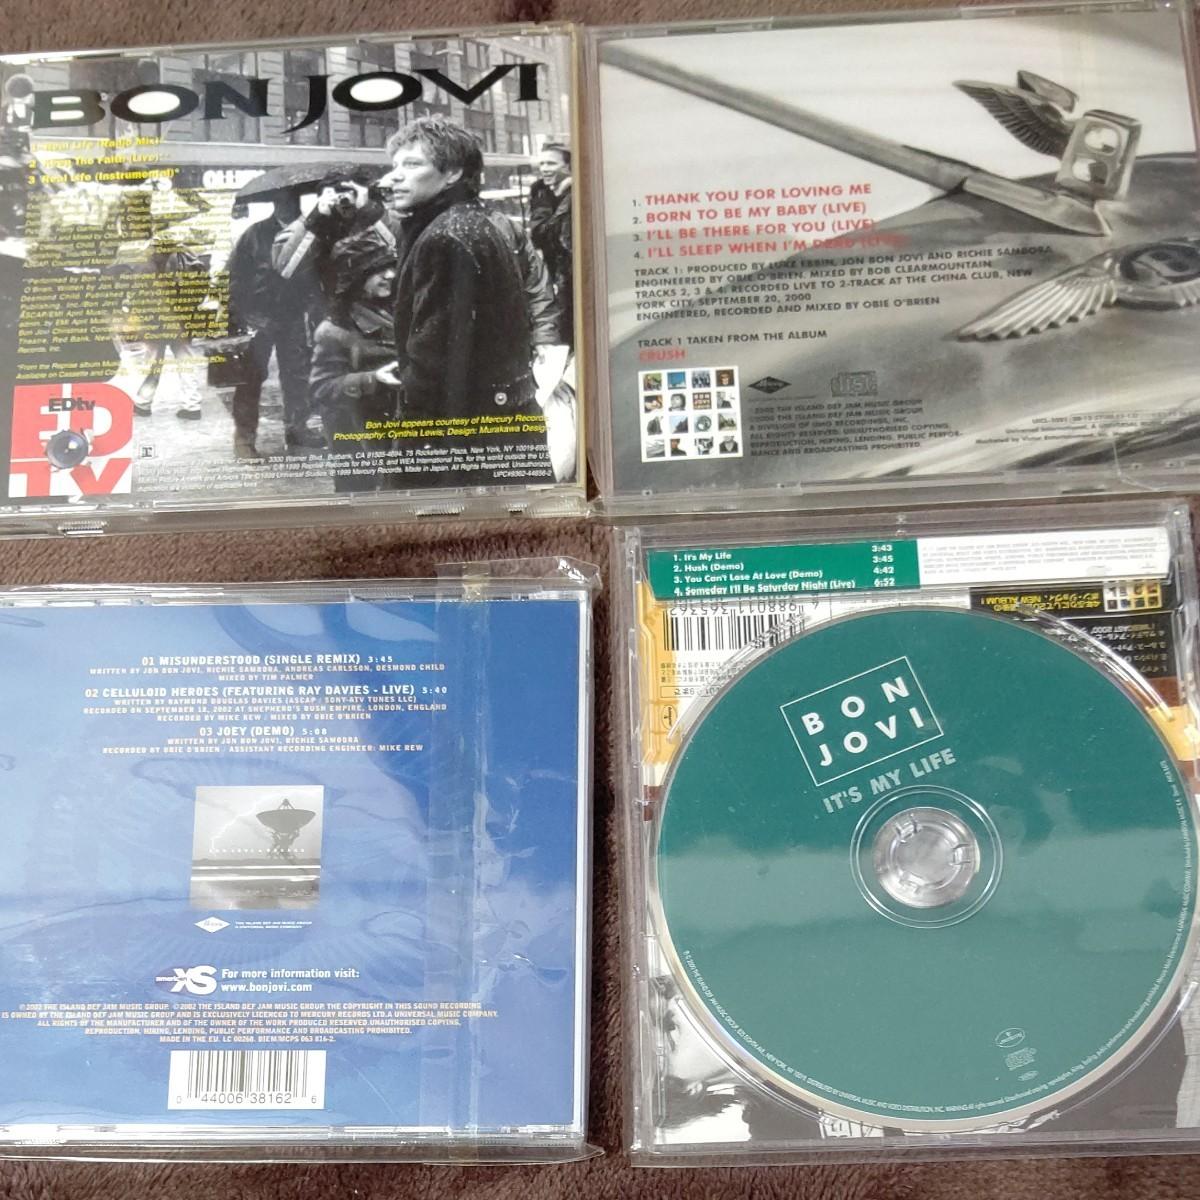 BON JOVI  ボン・ジョヴィ  CD4枚セット  IT'S MY LIFE